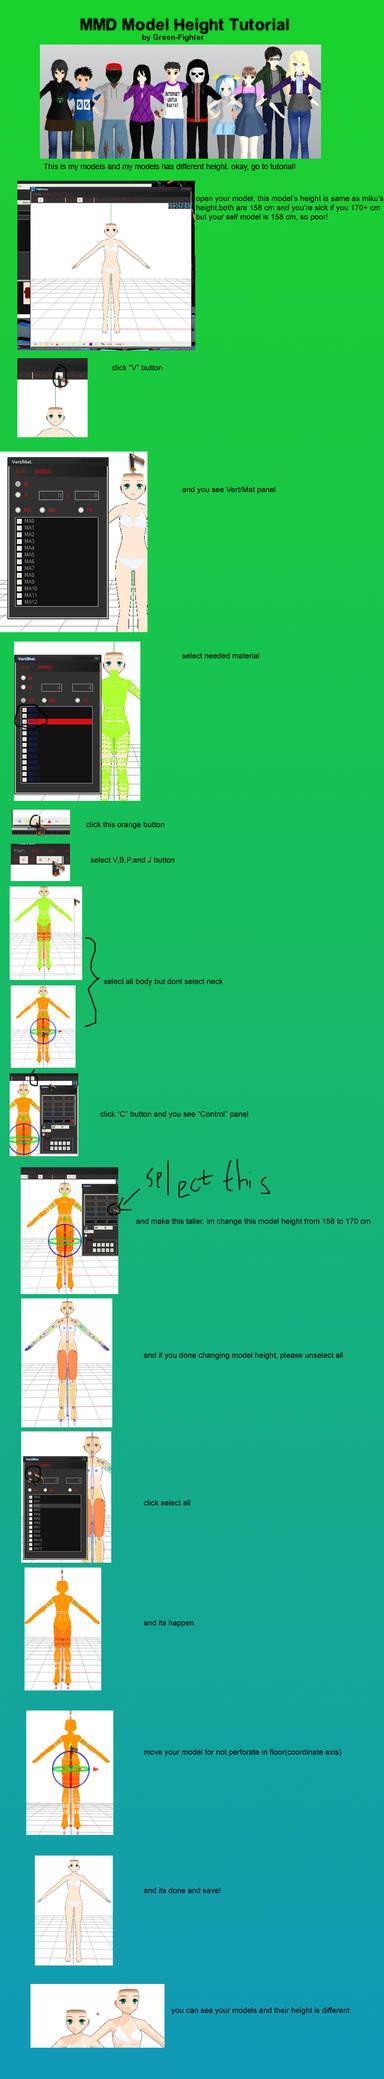 MMD Model Height tutorial